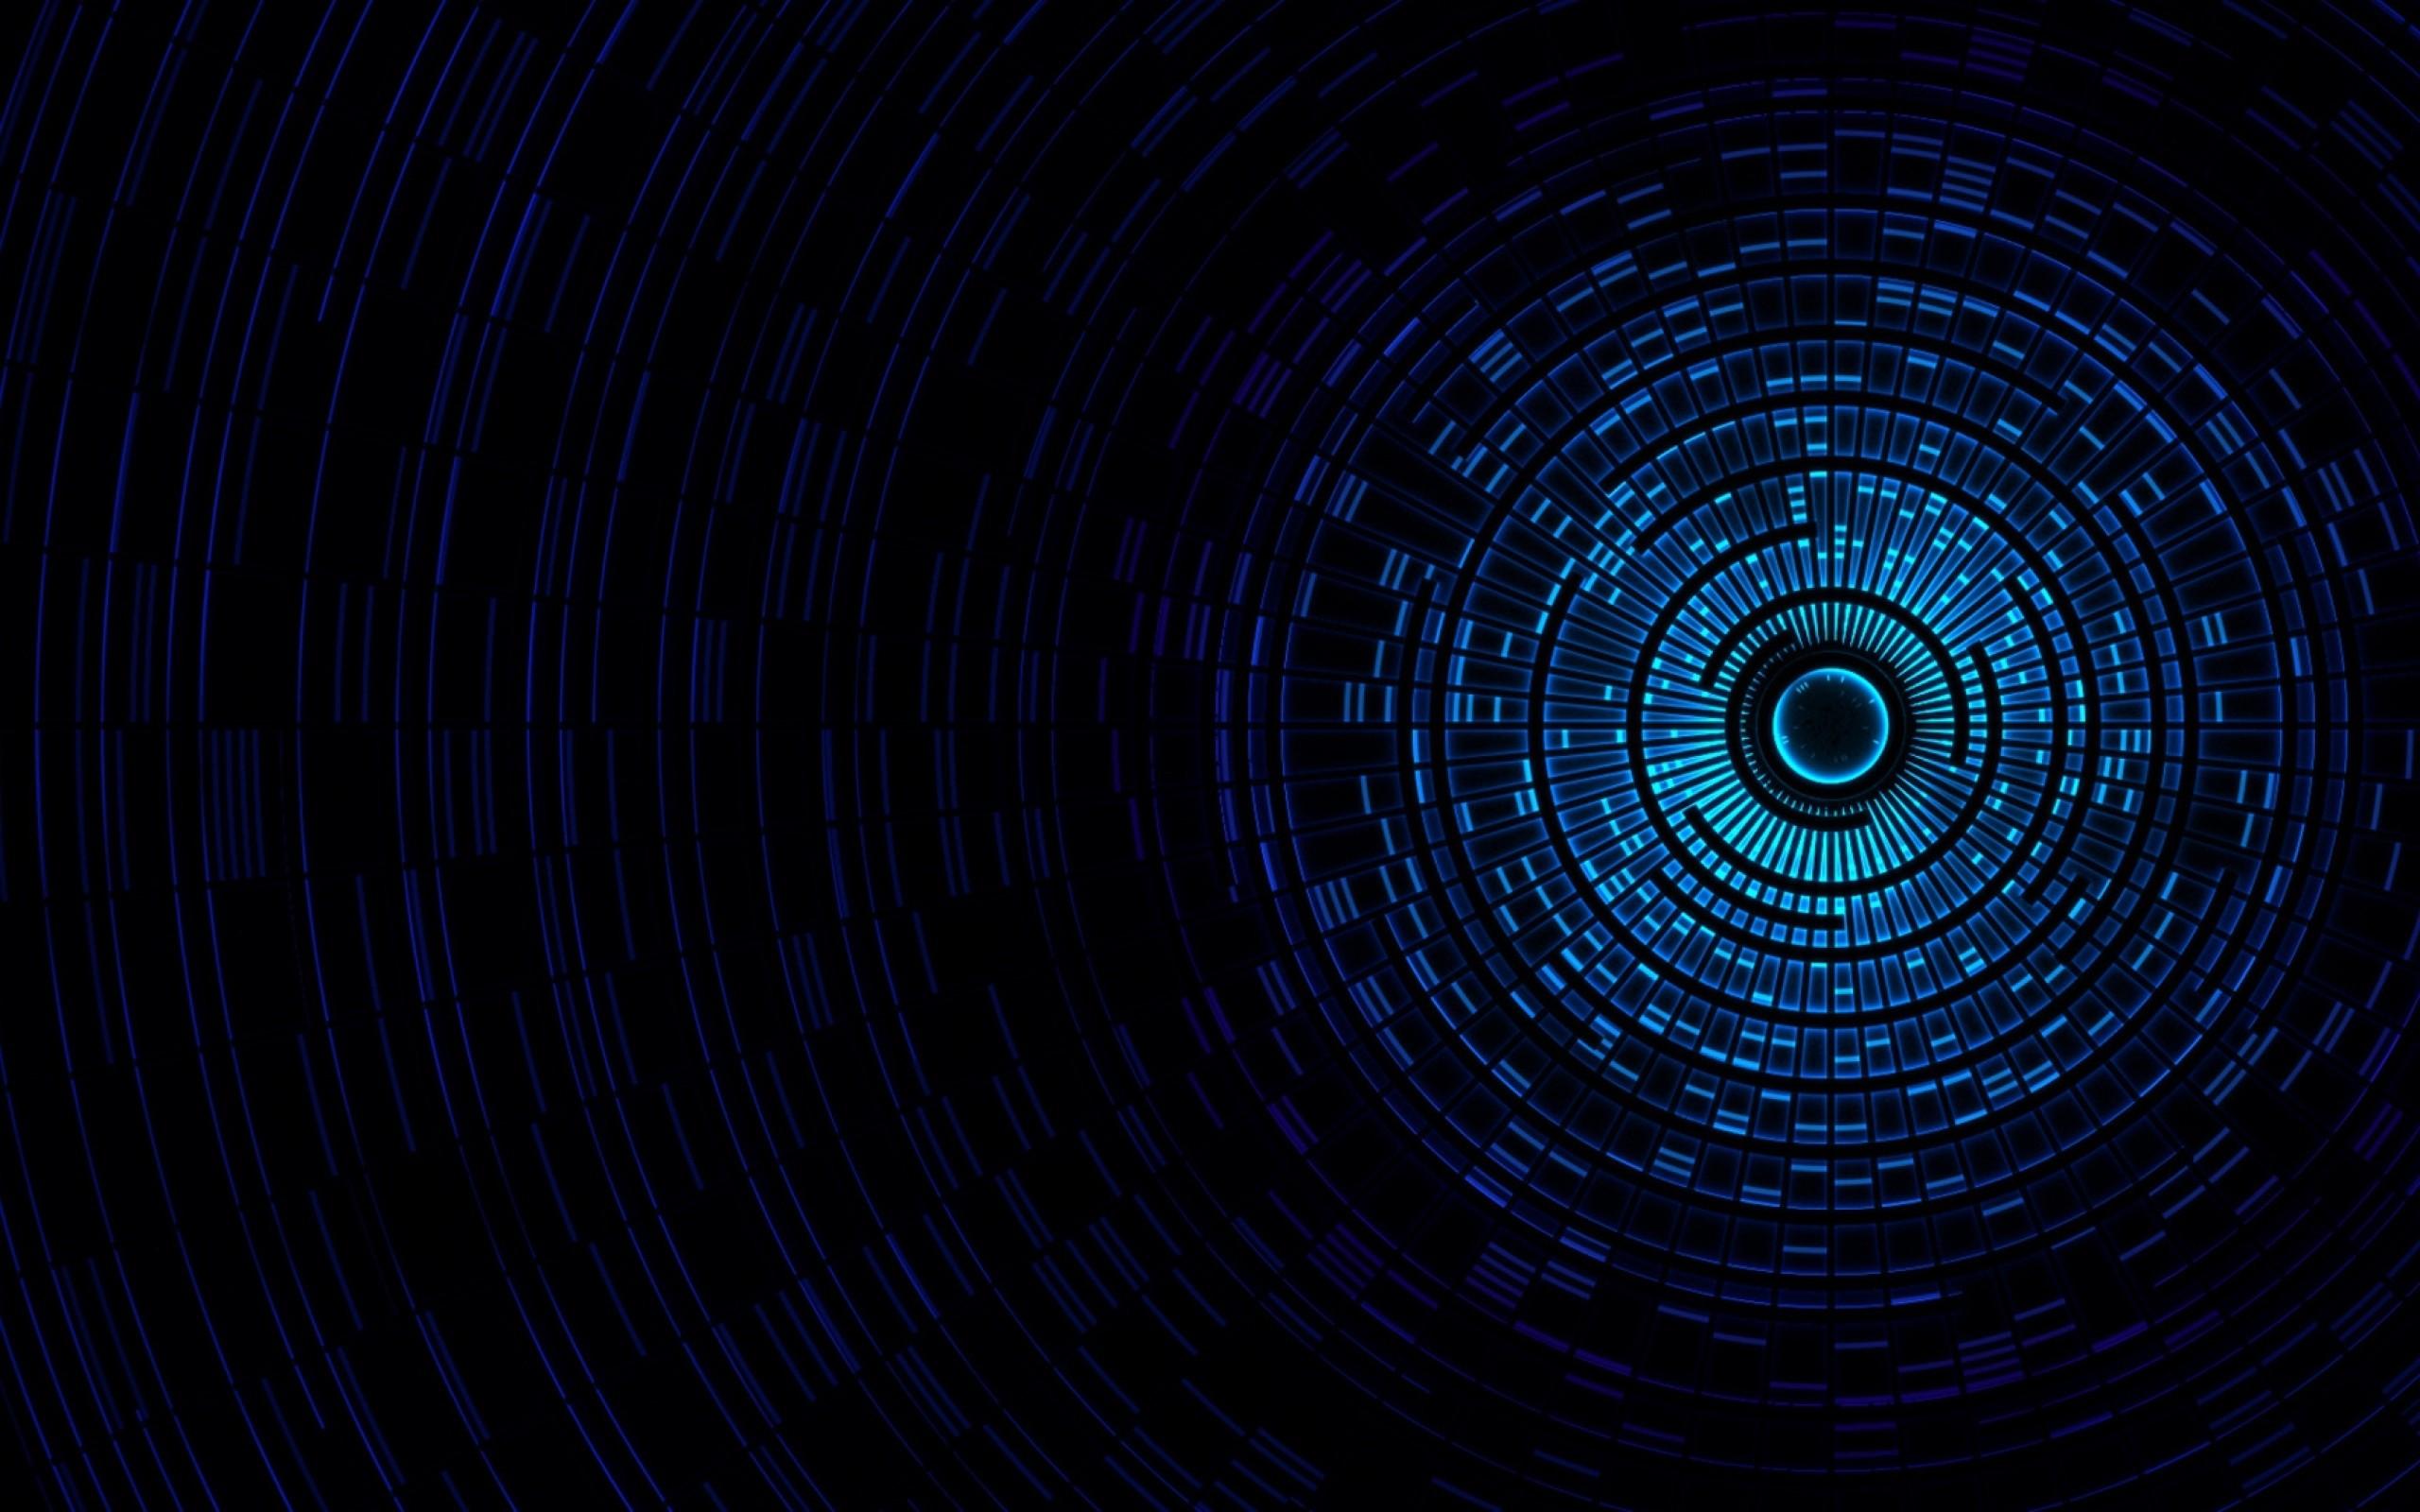 Dark Blue Circles Music Sound Abstract Techno